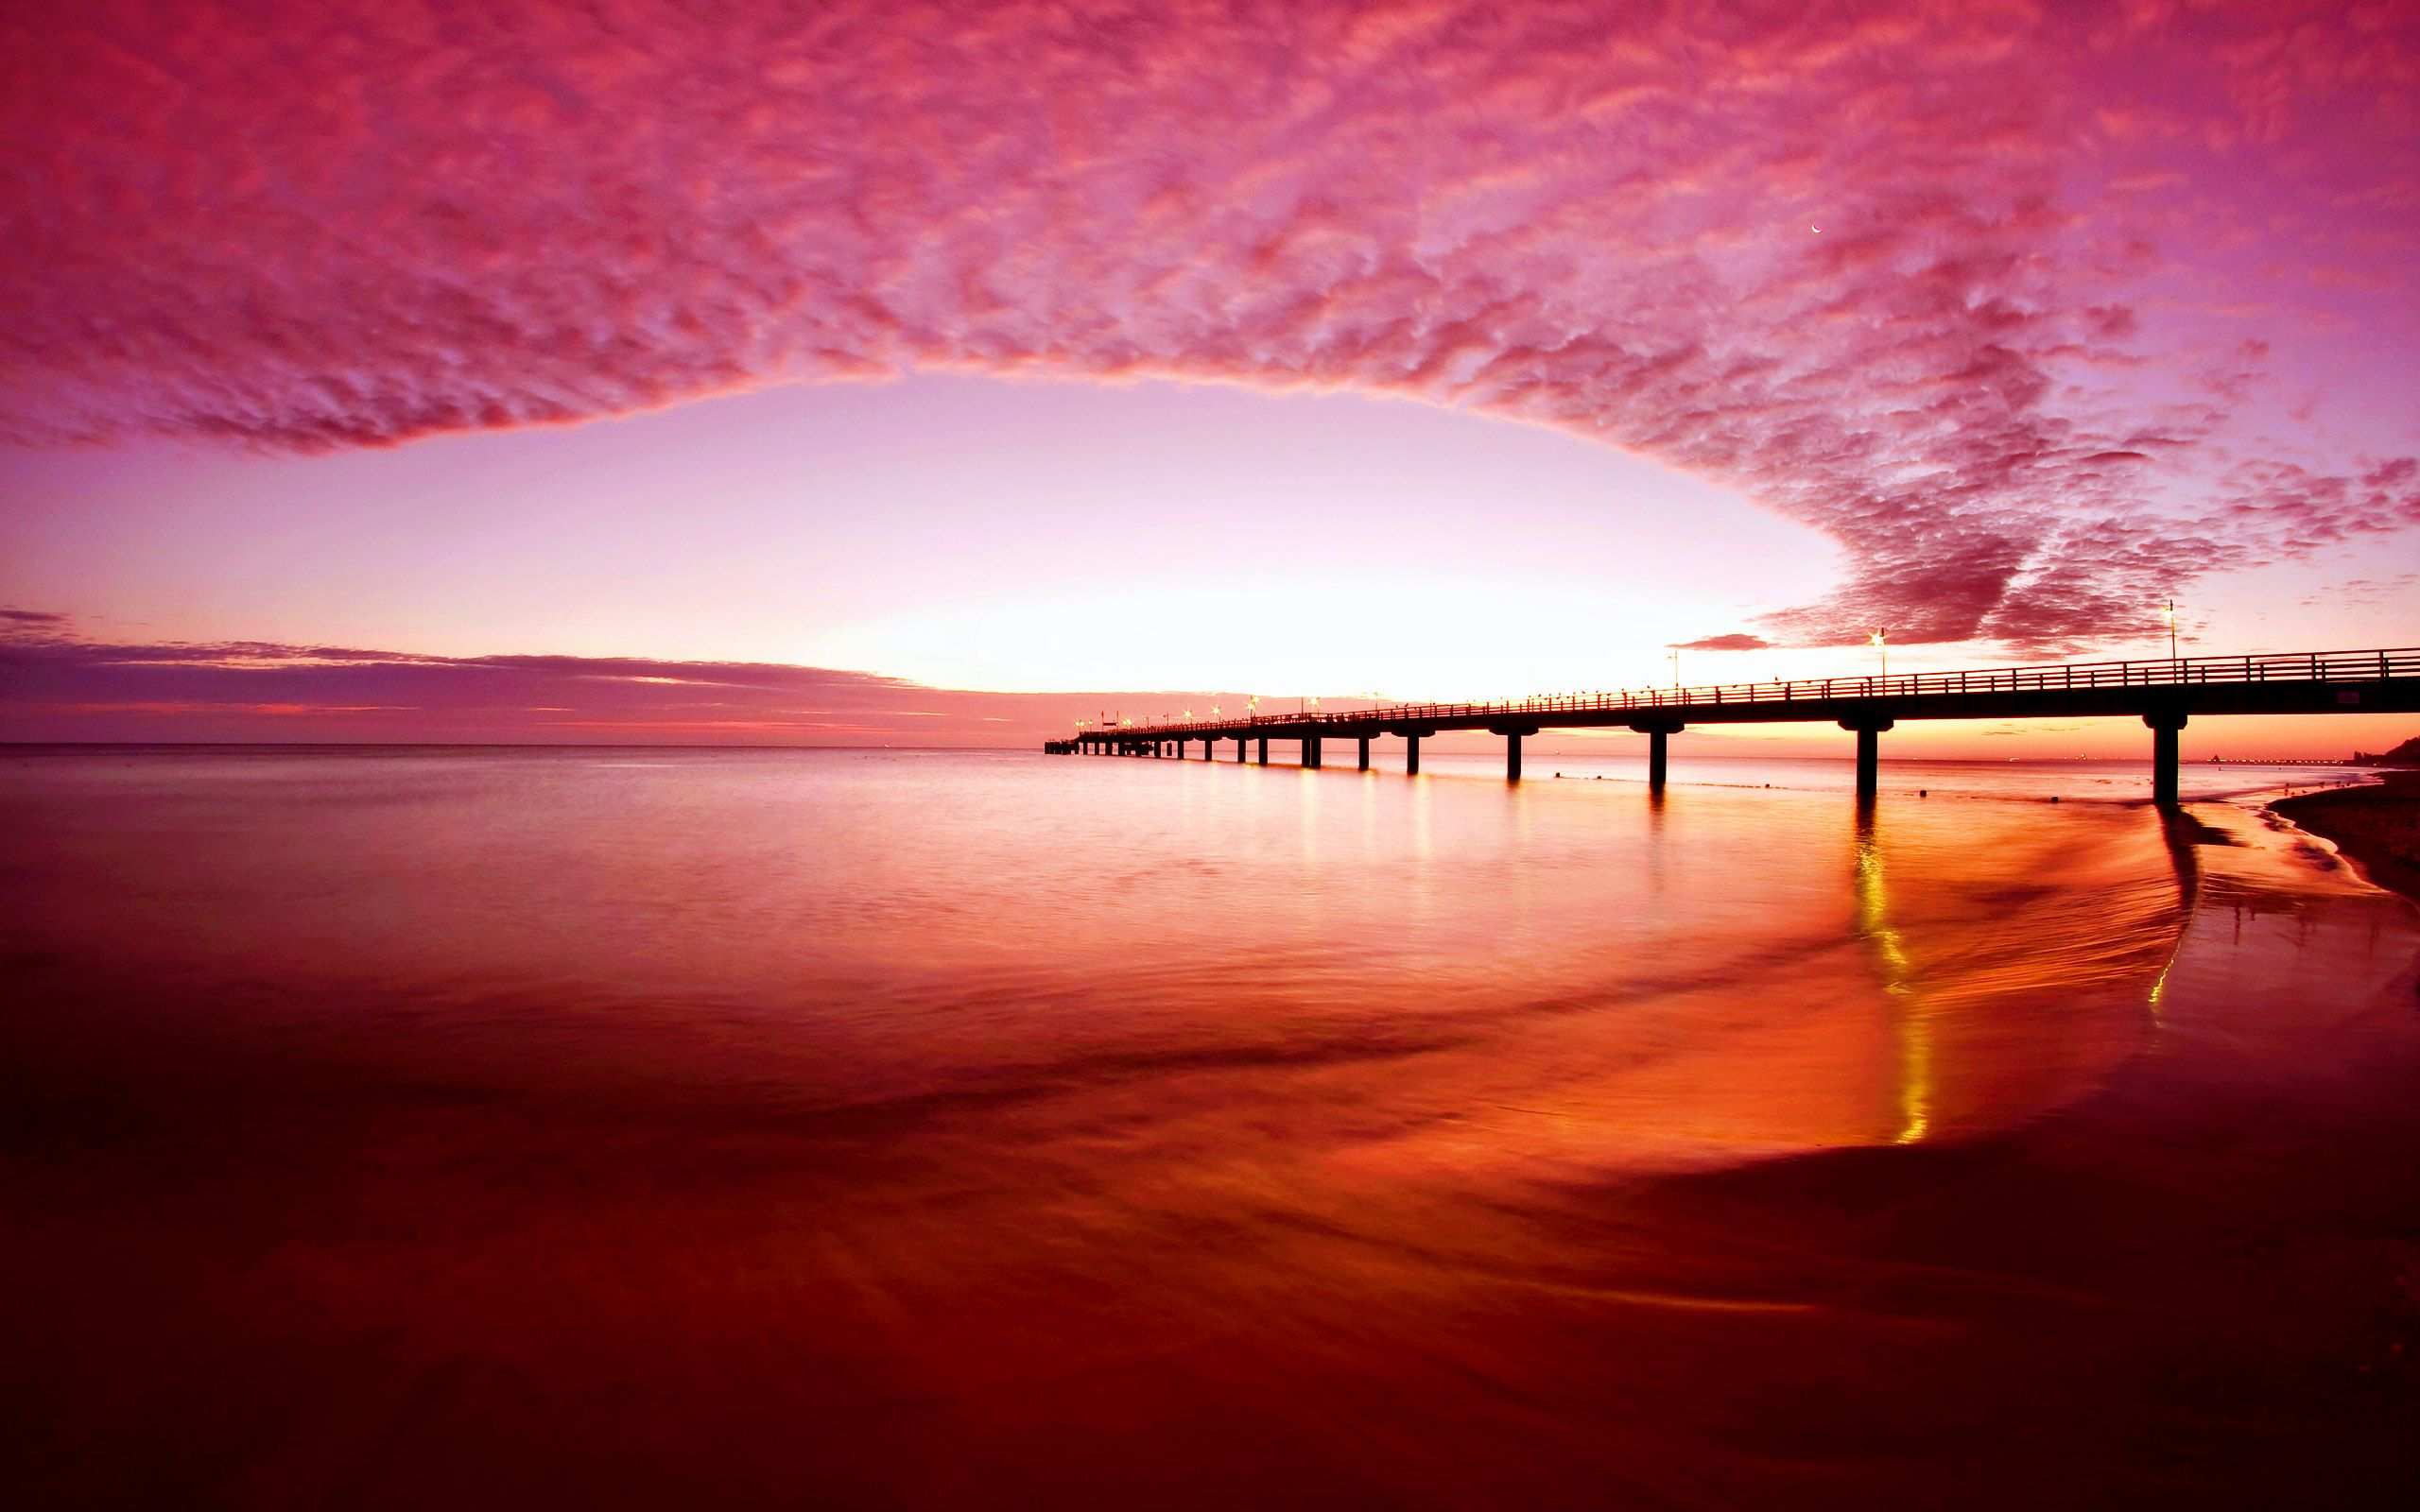 Red Sunset Beach Sunset Wallpaper Beautiful Views Beach Wallpaper Hd wallpaper sunset sky red bridge